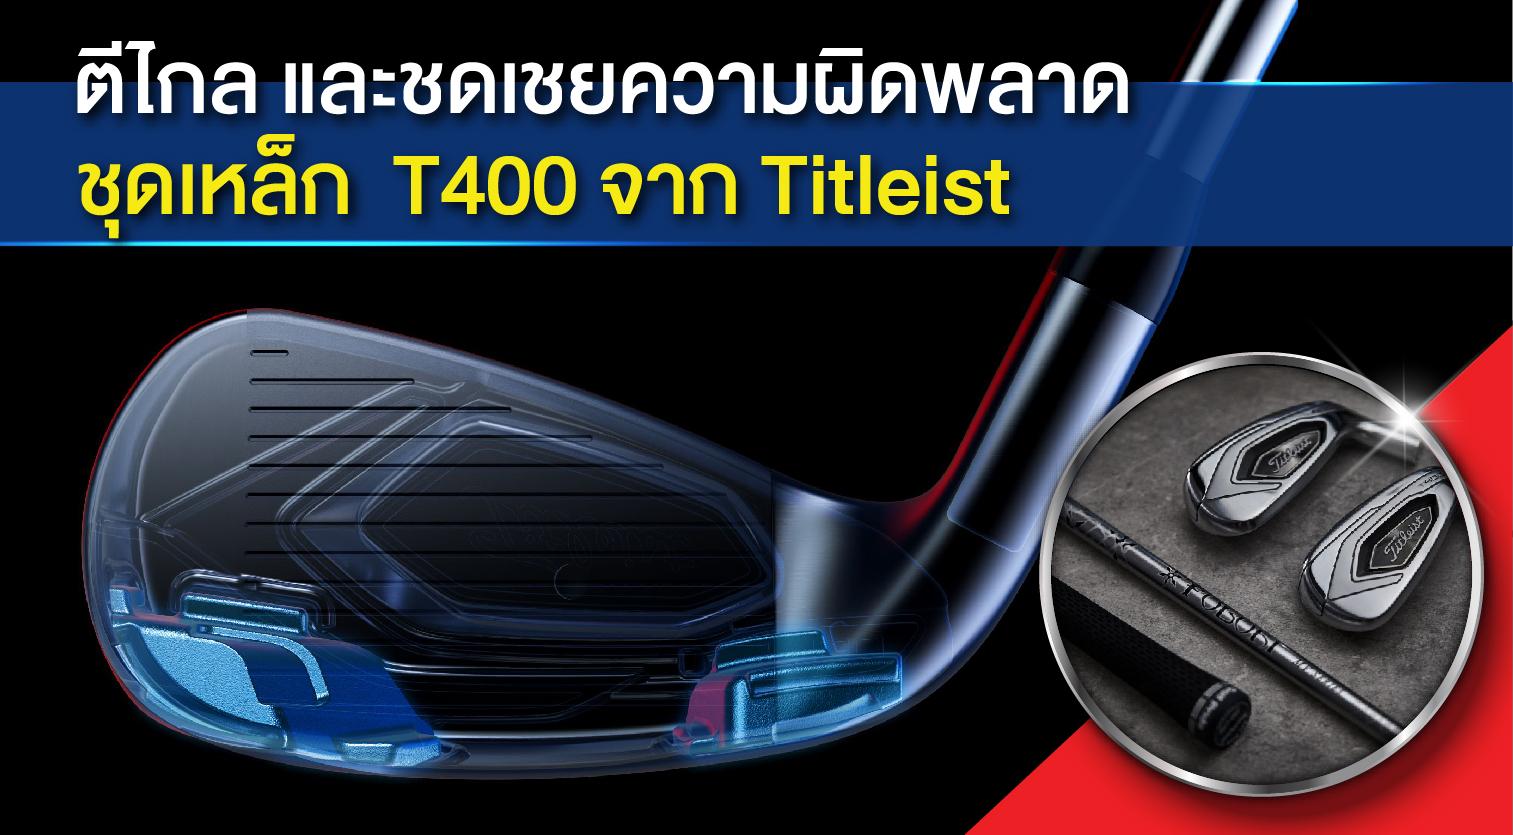 Titleist T400 รุ่นใหม่วางตลาดแล้ววันนี้